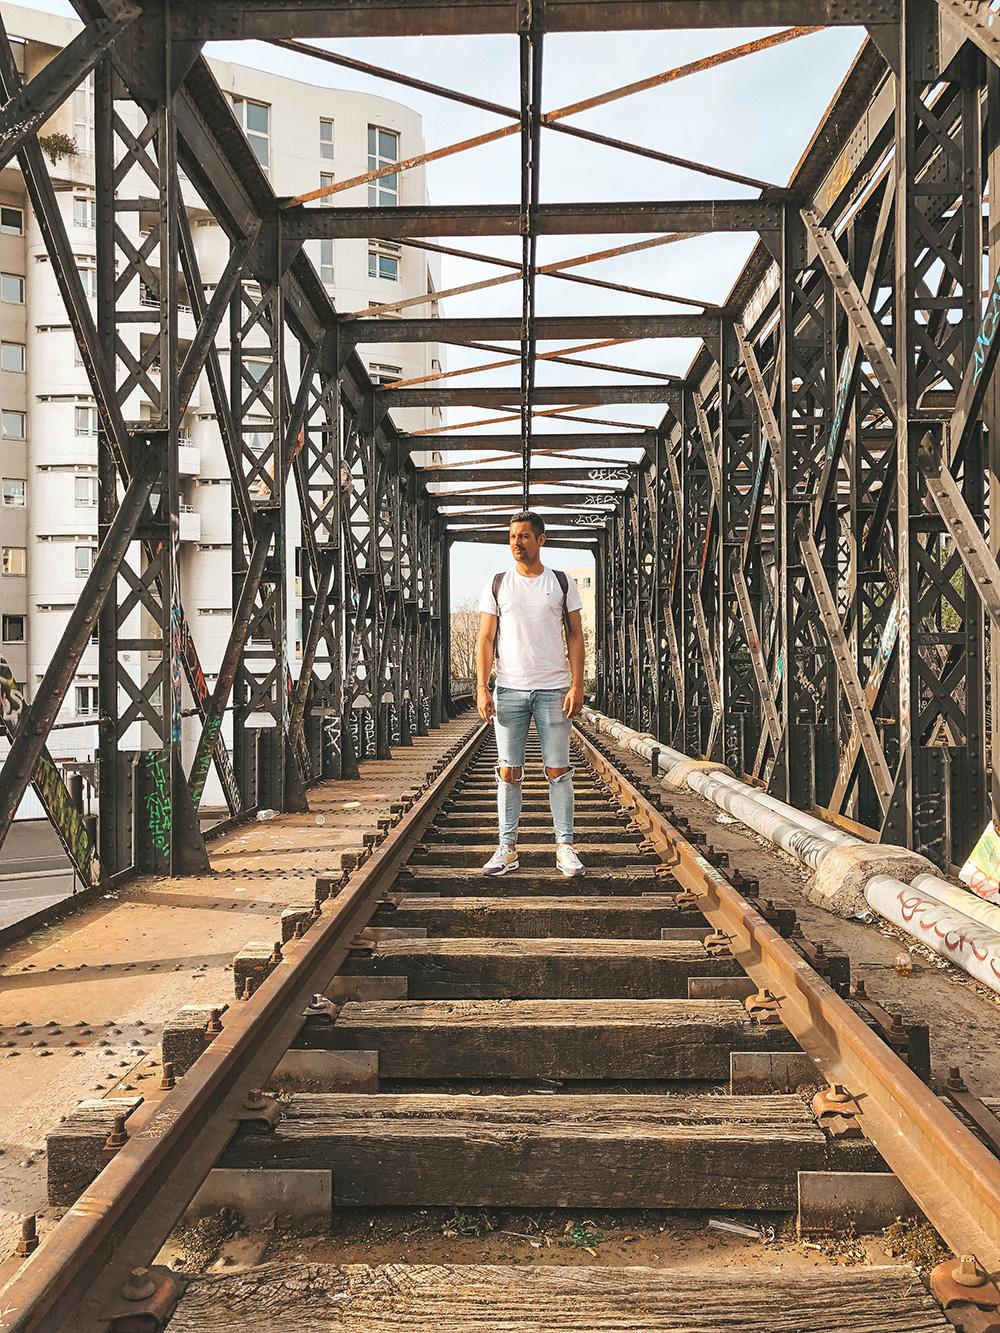 Nicolas prend la pose sur les anciens rails